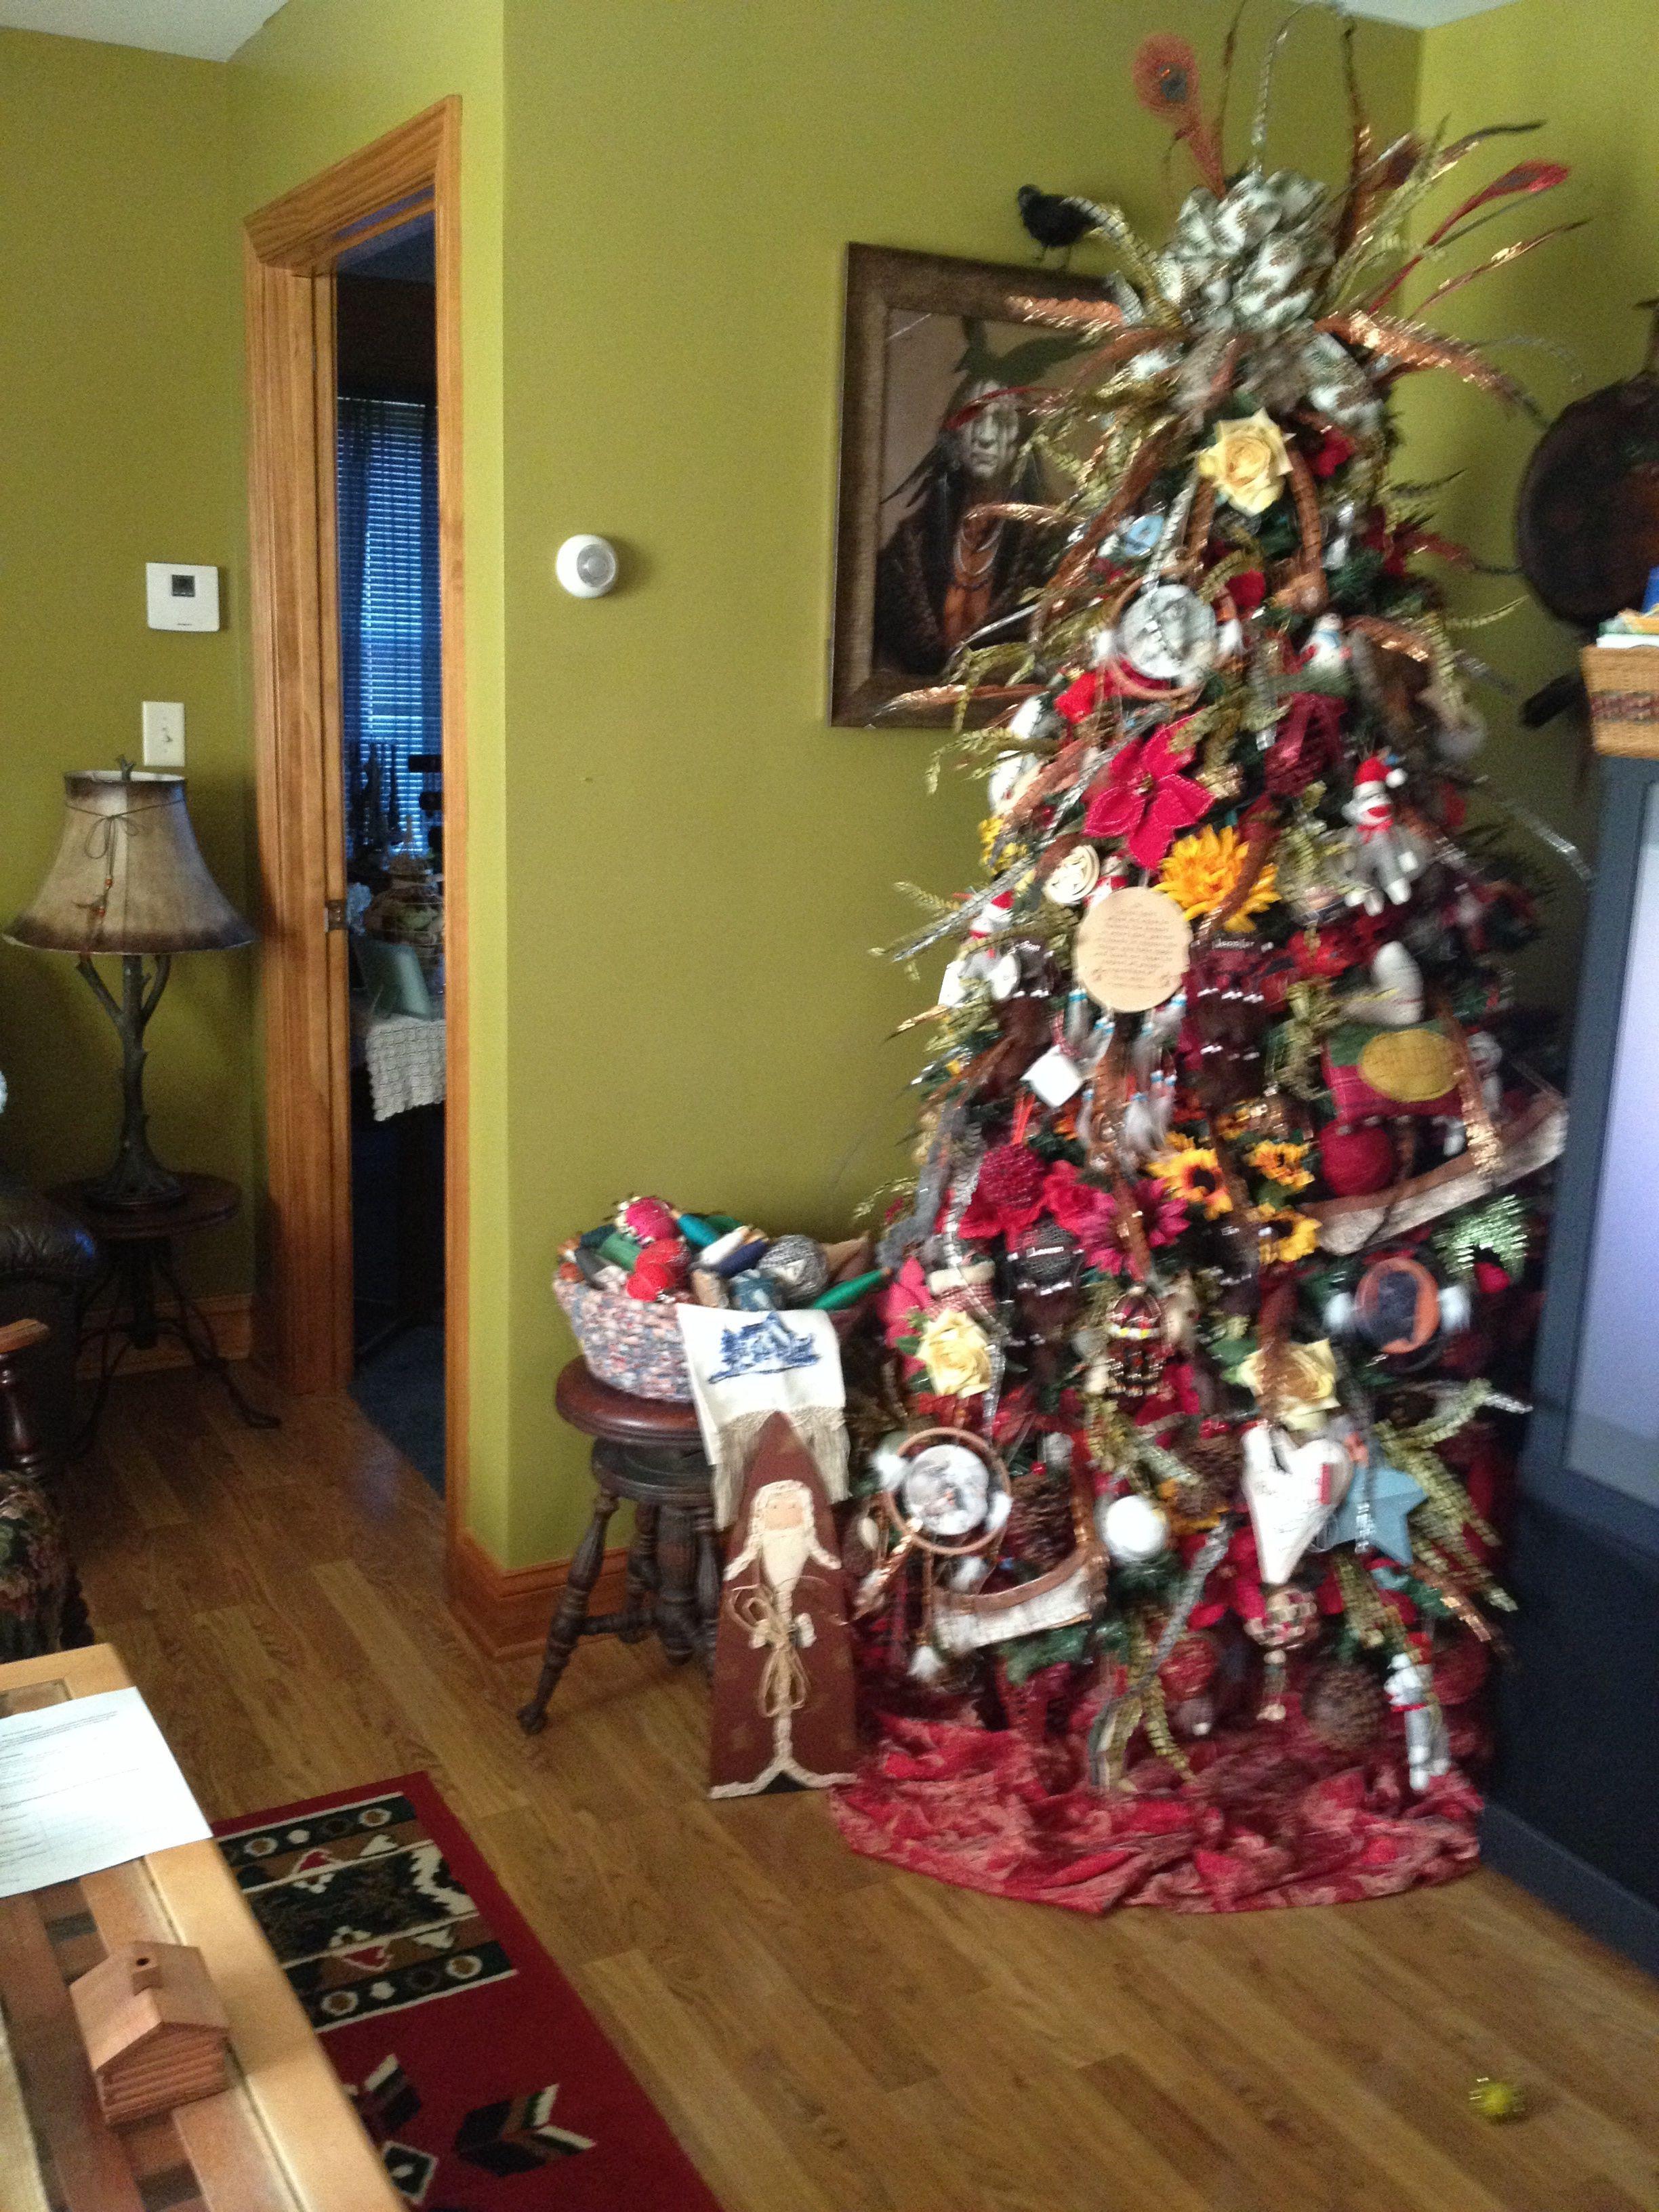 Country Rustic Native American Christmas Tree Christmas Crafts For Toddlers Christmas Tree Ornaments To Make Kids Christmas Ornaments